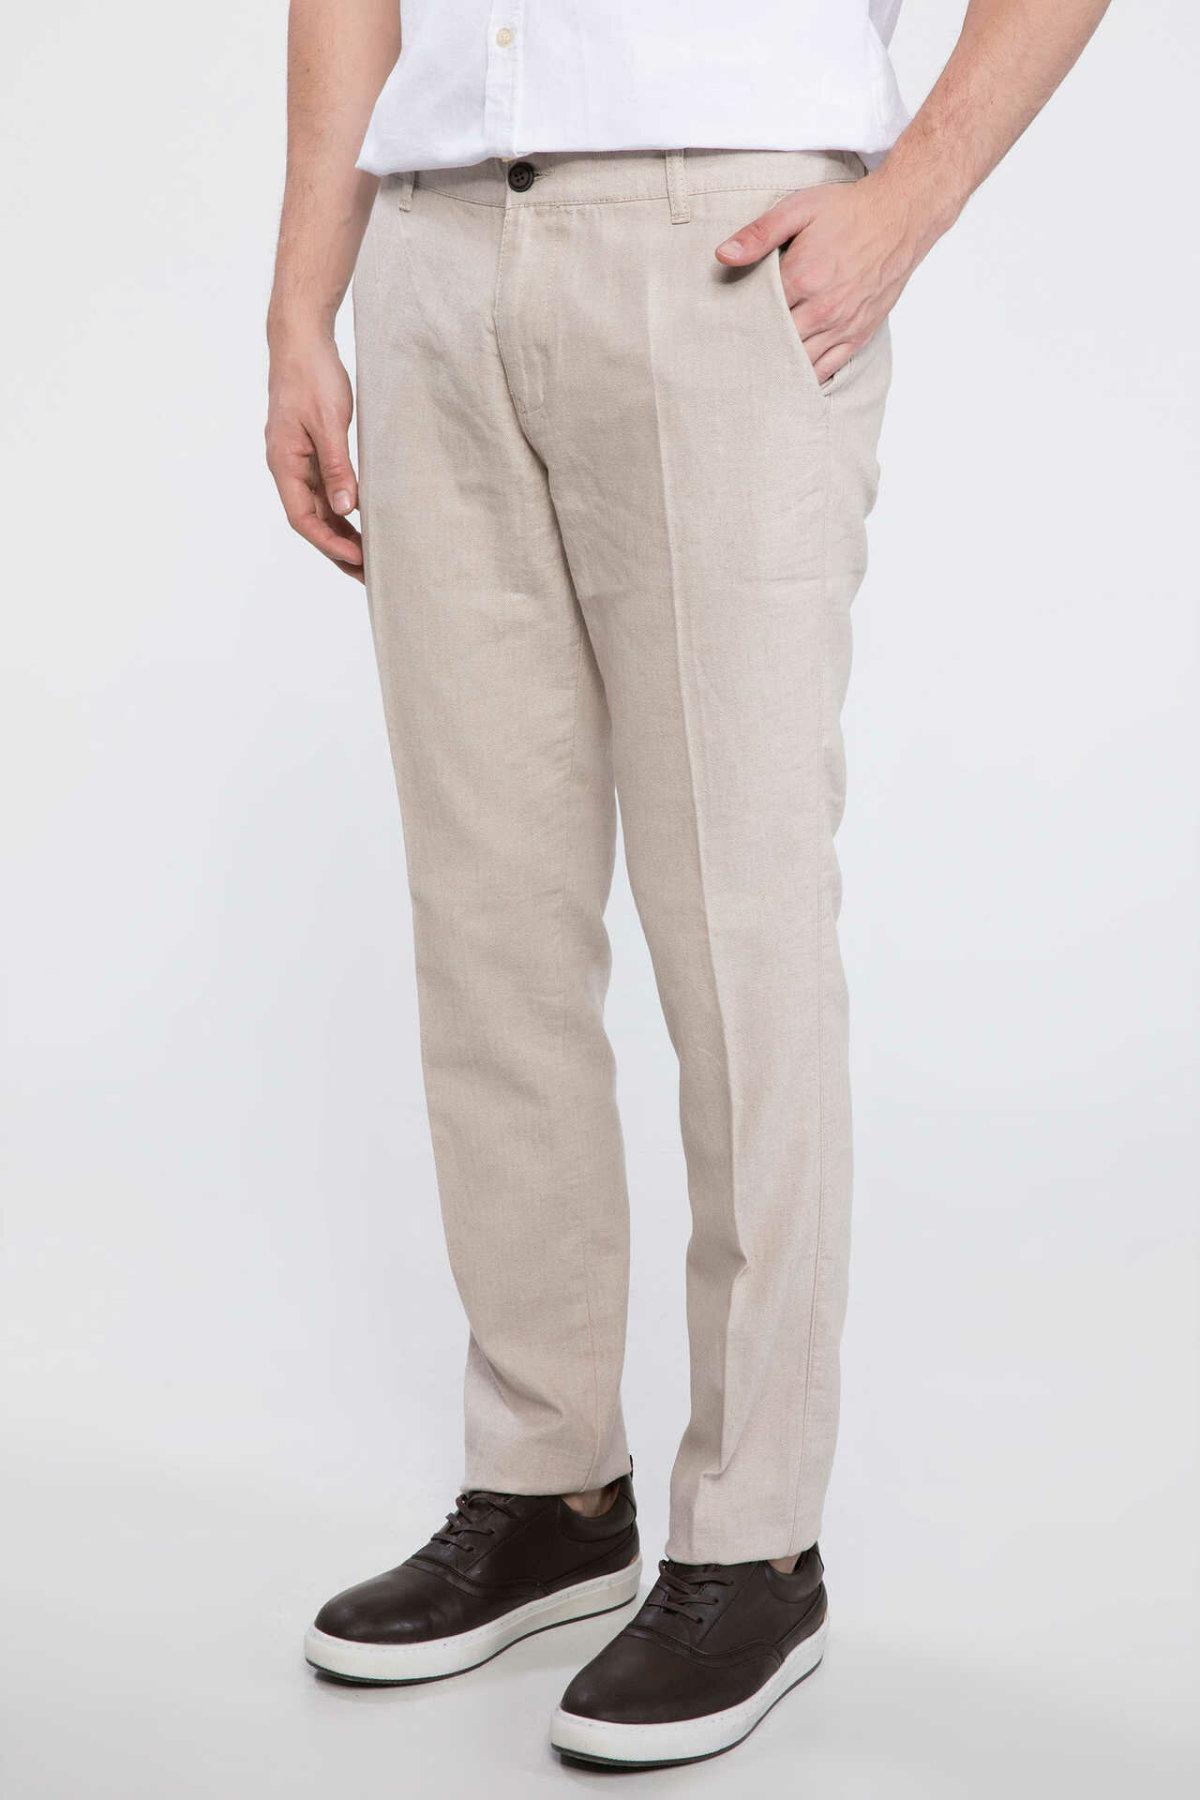 DeFacto Man Summer Smart Casual Beige Long Pants Trousers Men Straight Cargo Pants Male Bottoms-I7739AZ18SM